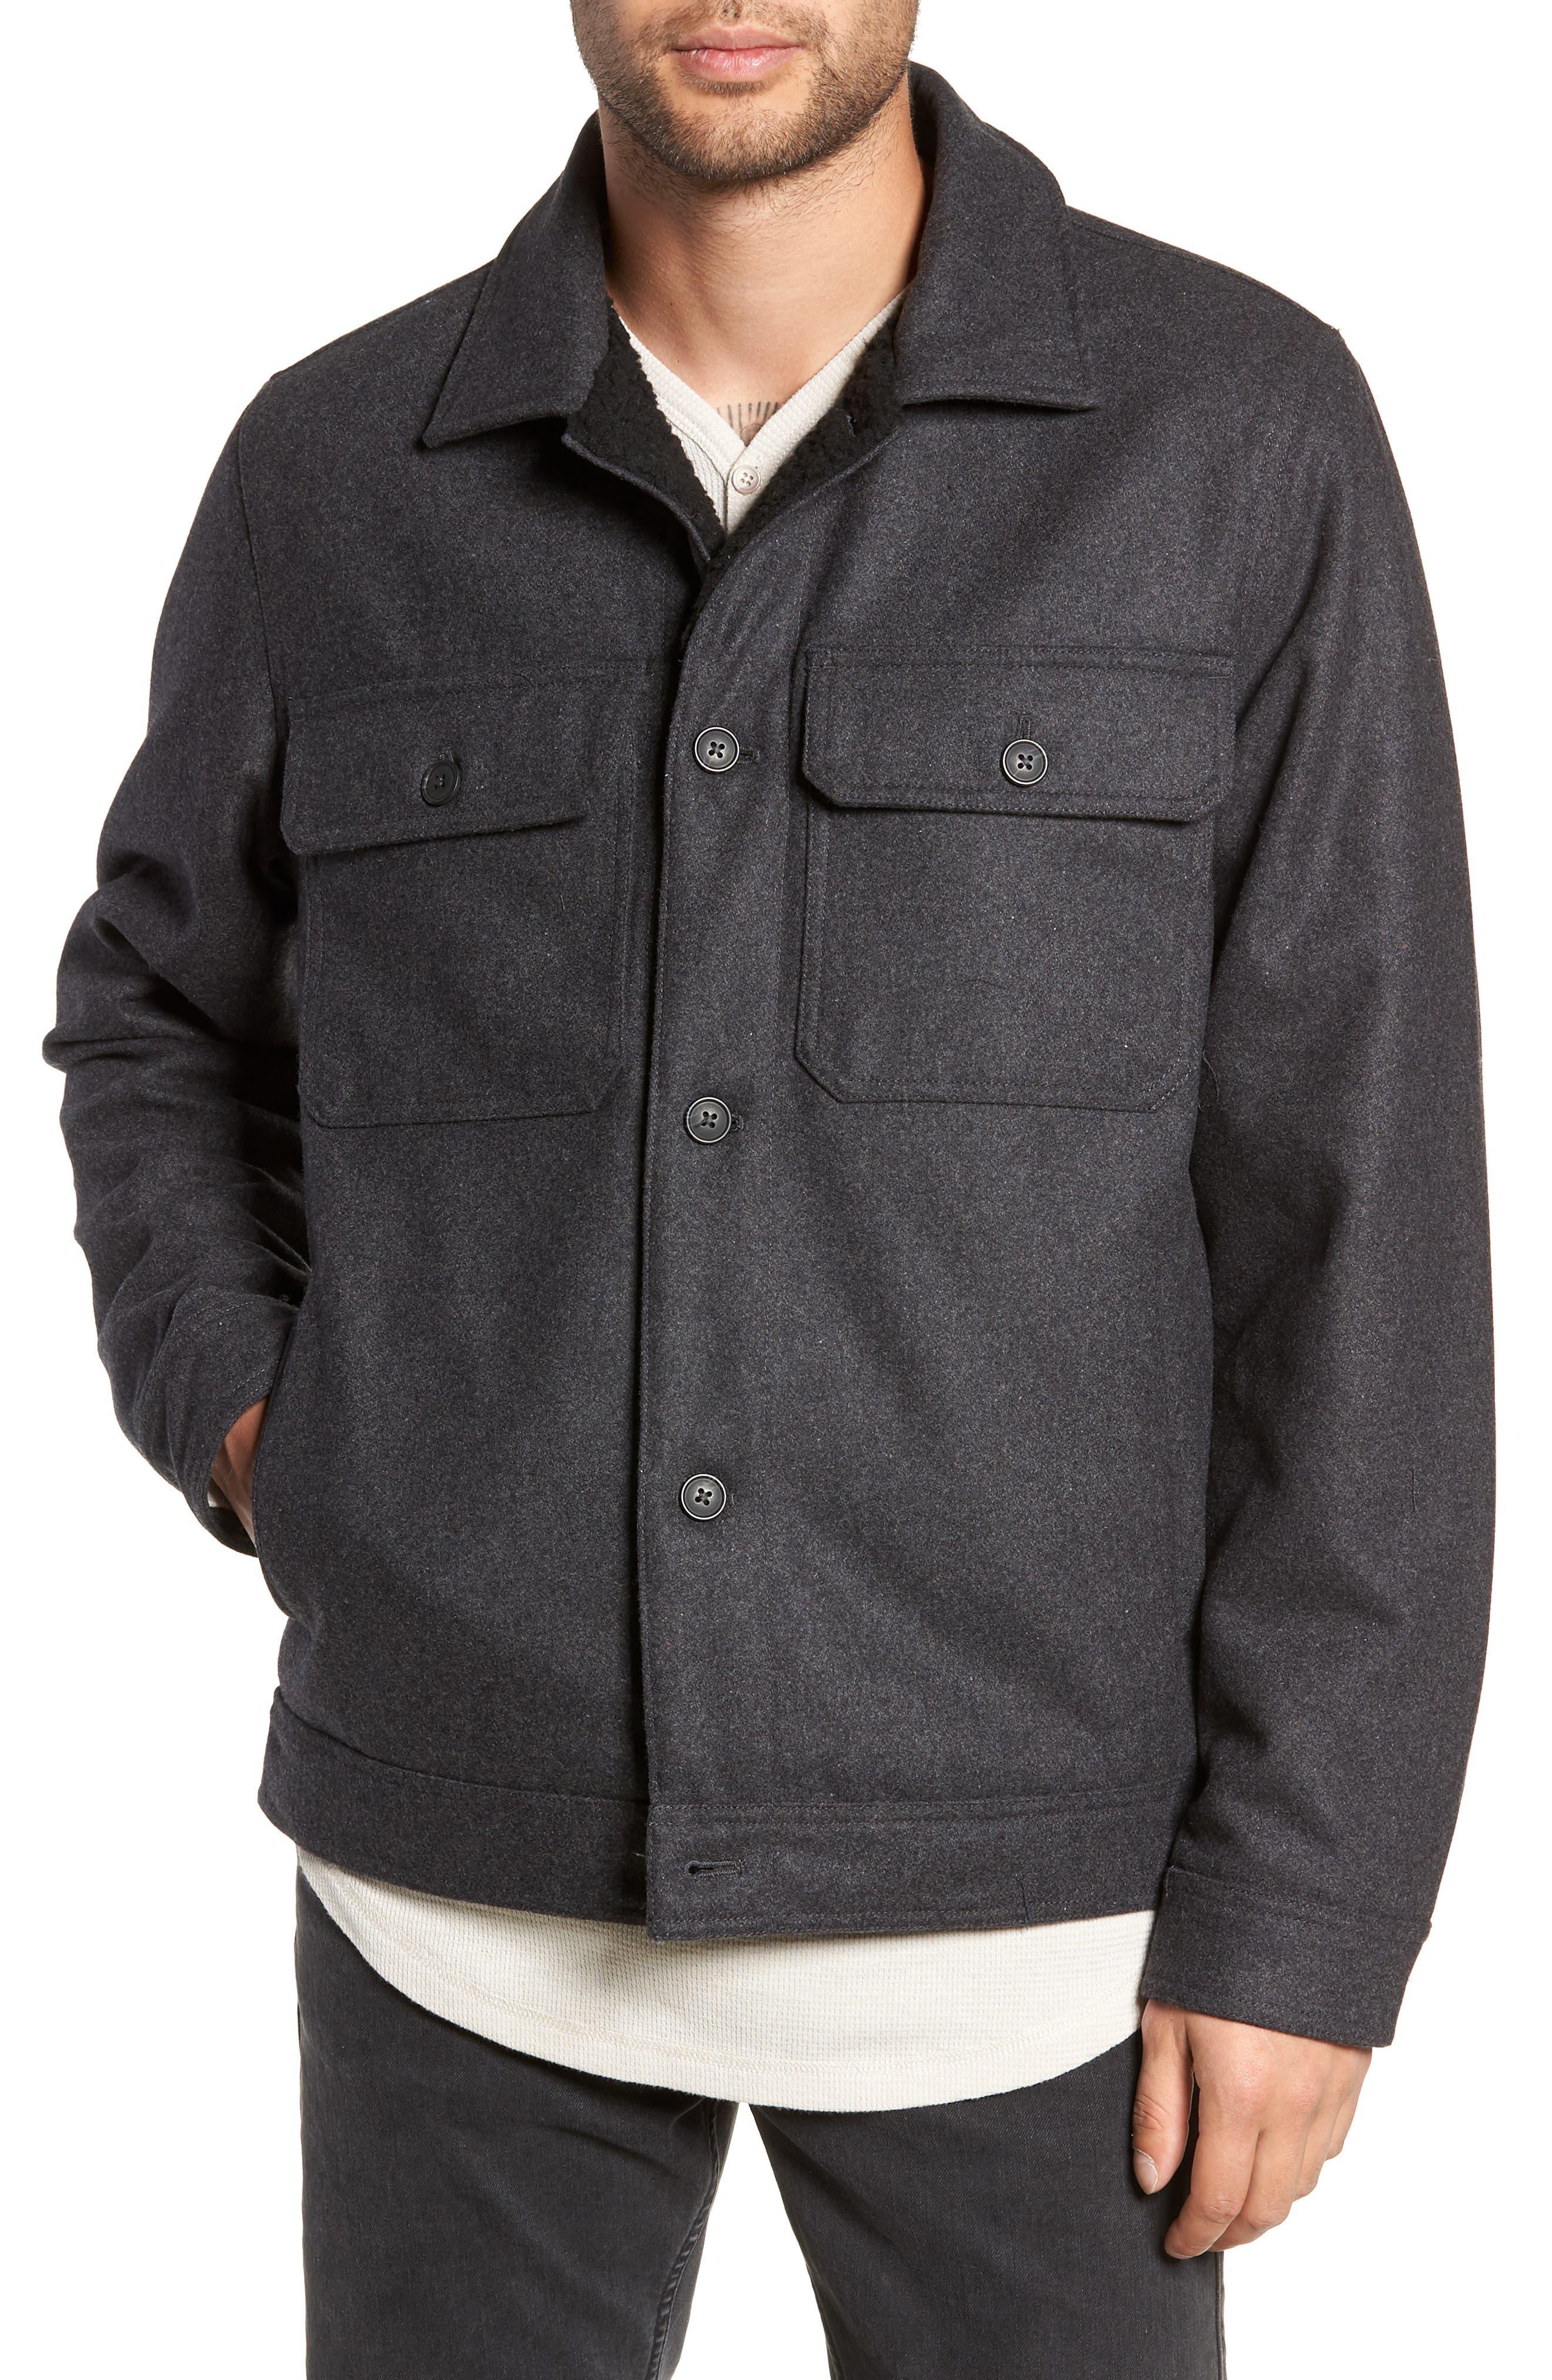 Rossmore Jacket,                             Alternate thumbnail 4, color,                             ASPHALT